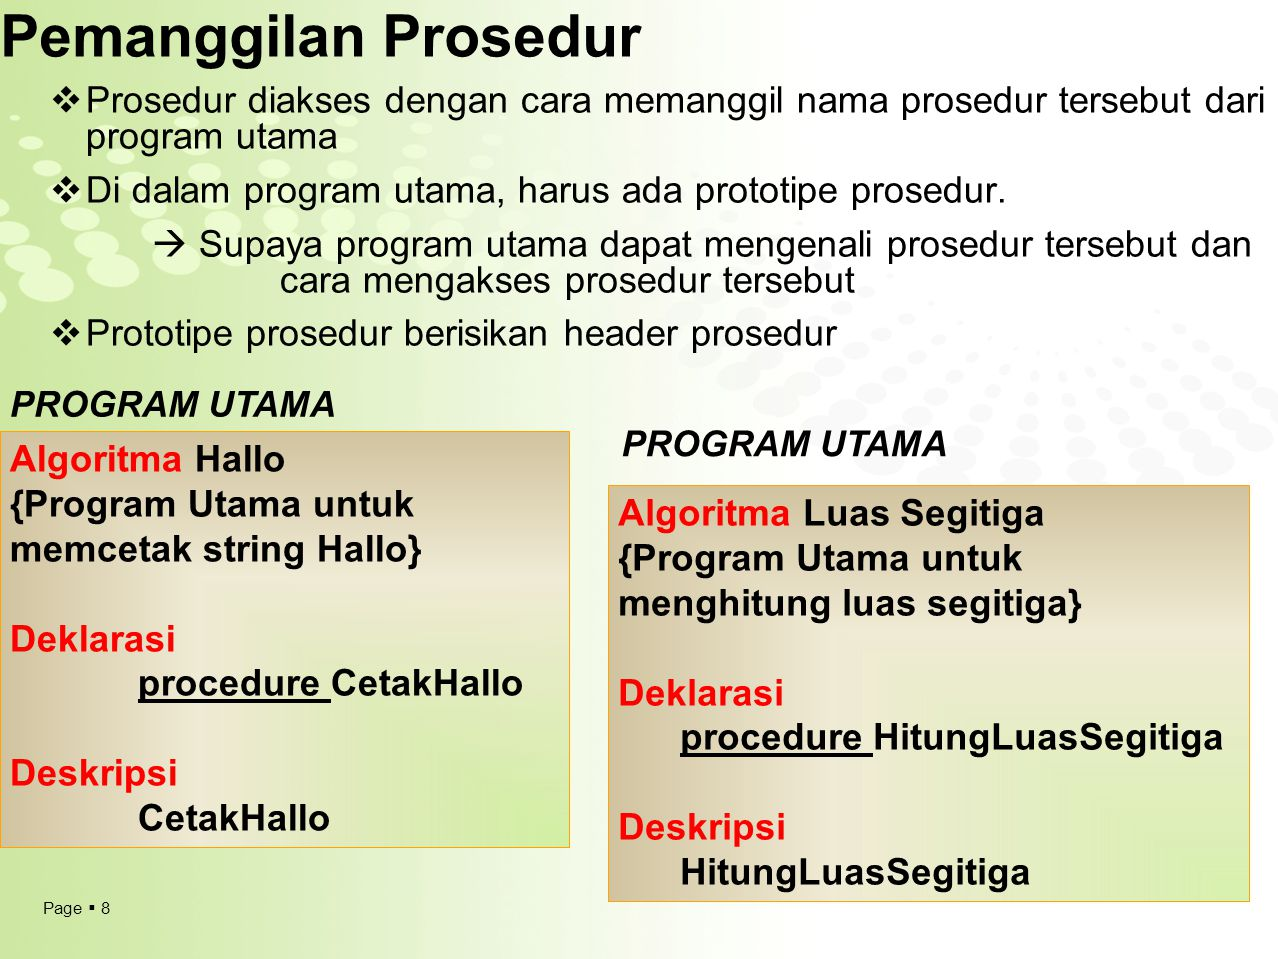 Pemanggilan Prosedur Prosedur diakses dengan cara memanggil nama prosedur tersebut dari program utama.